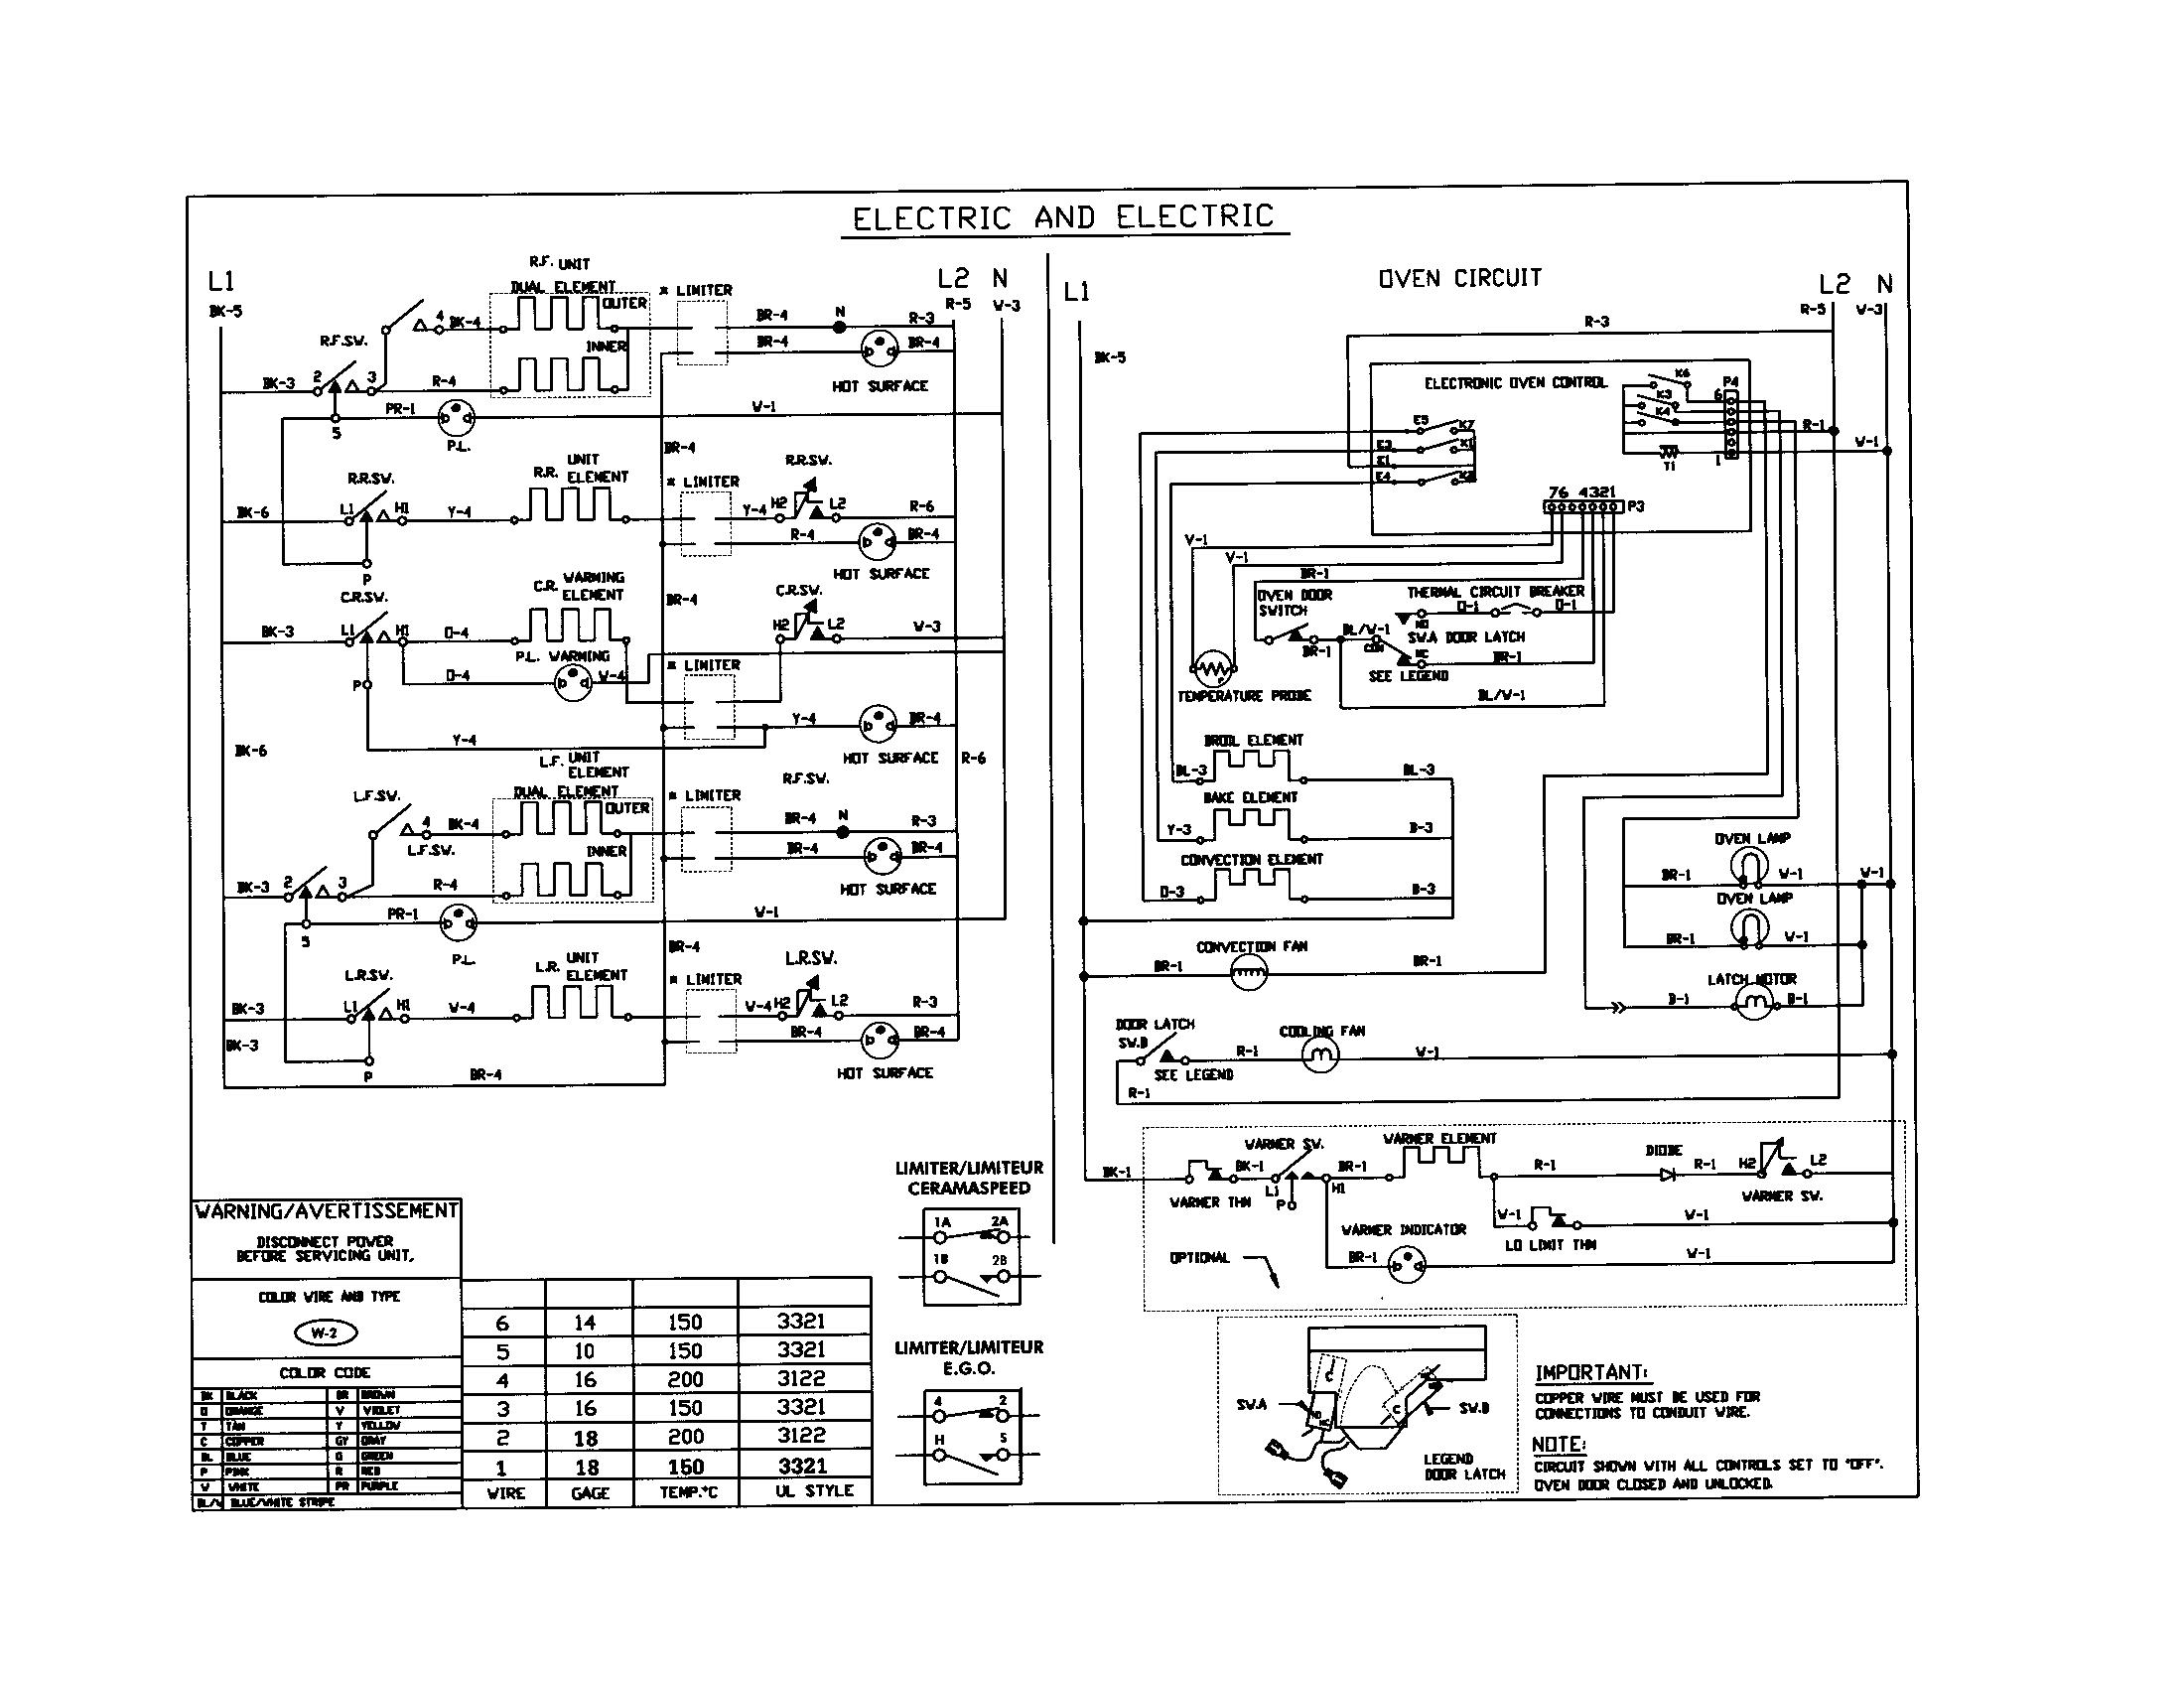 diagram freezer wiring cpf100c wiring diagram diagram freezer wiring cpf100c